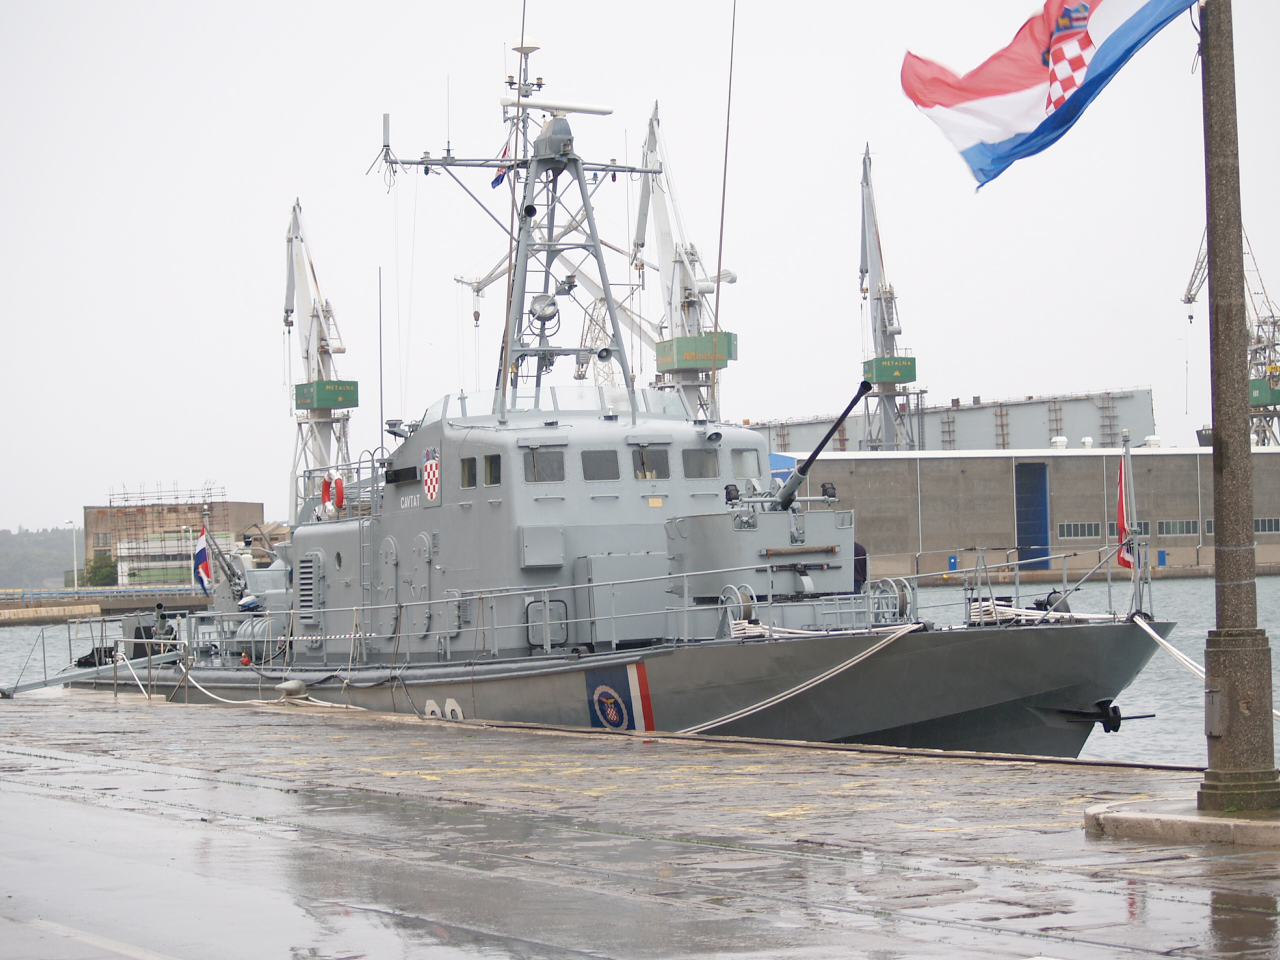 [ODB] Hrvatska Ratna Mornarica (Croatie) OB-63_Cavtat